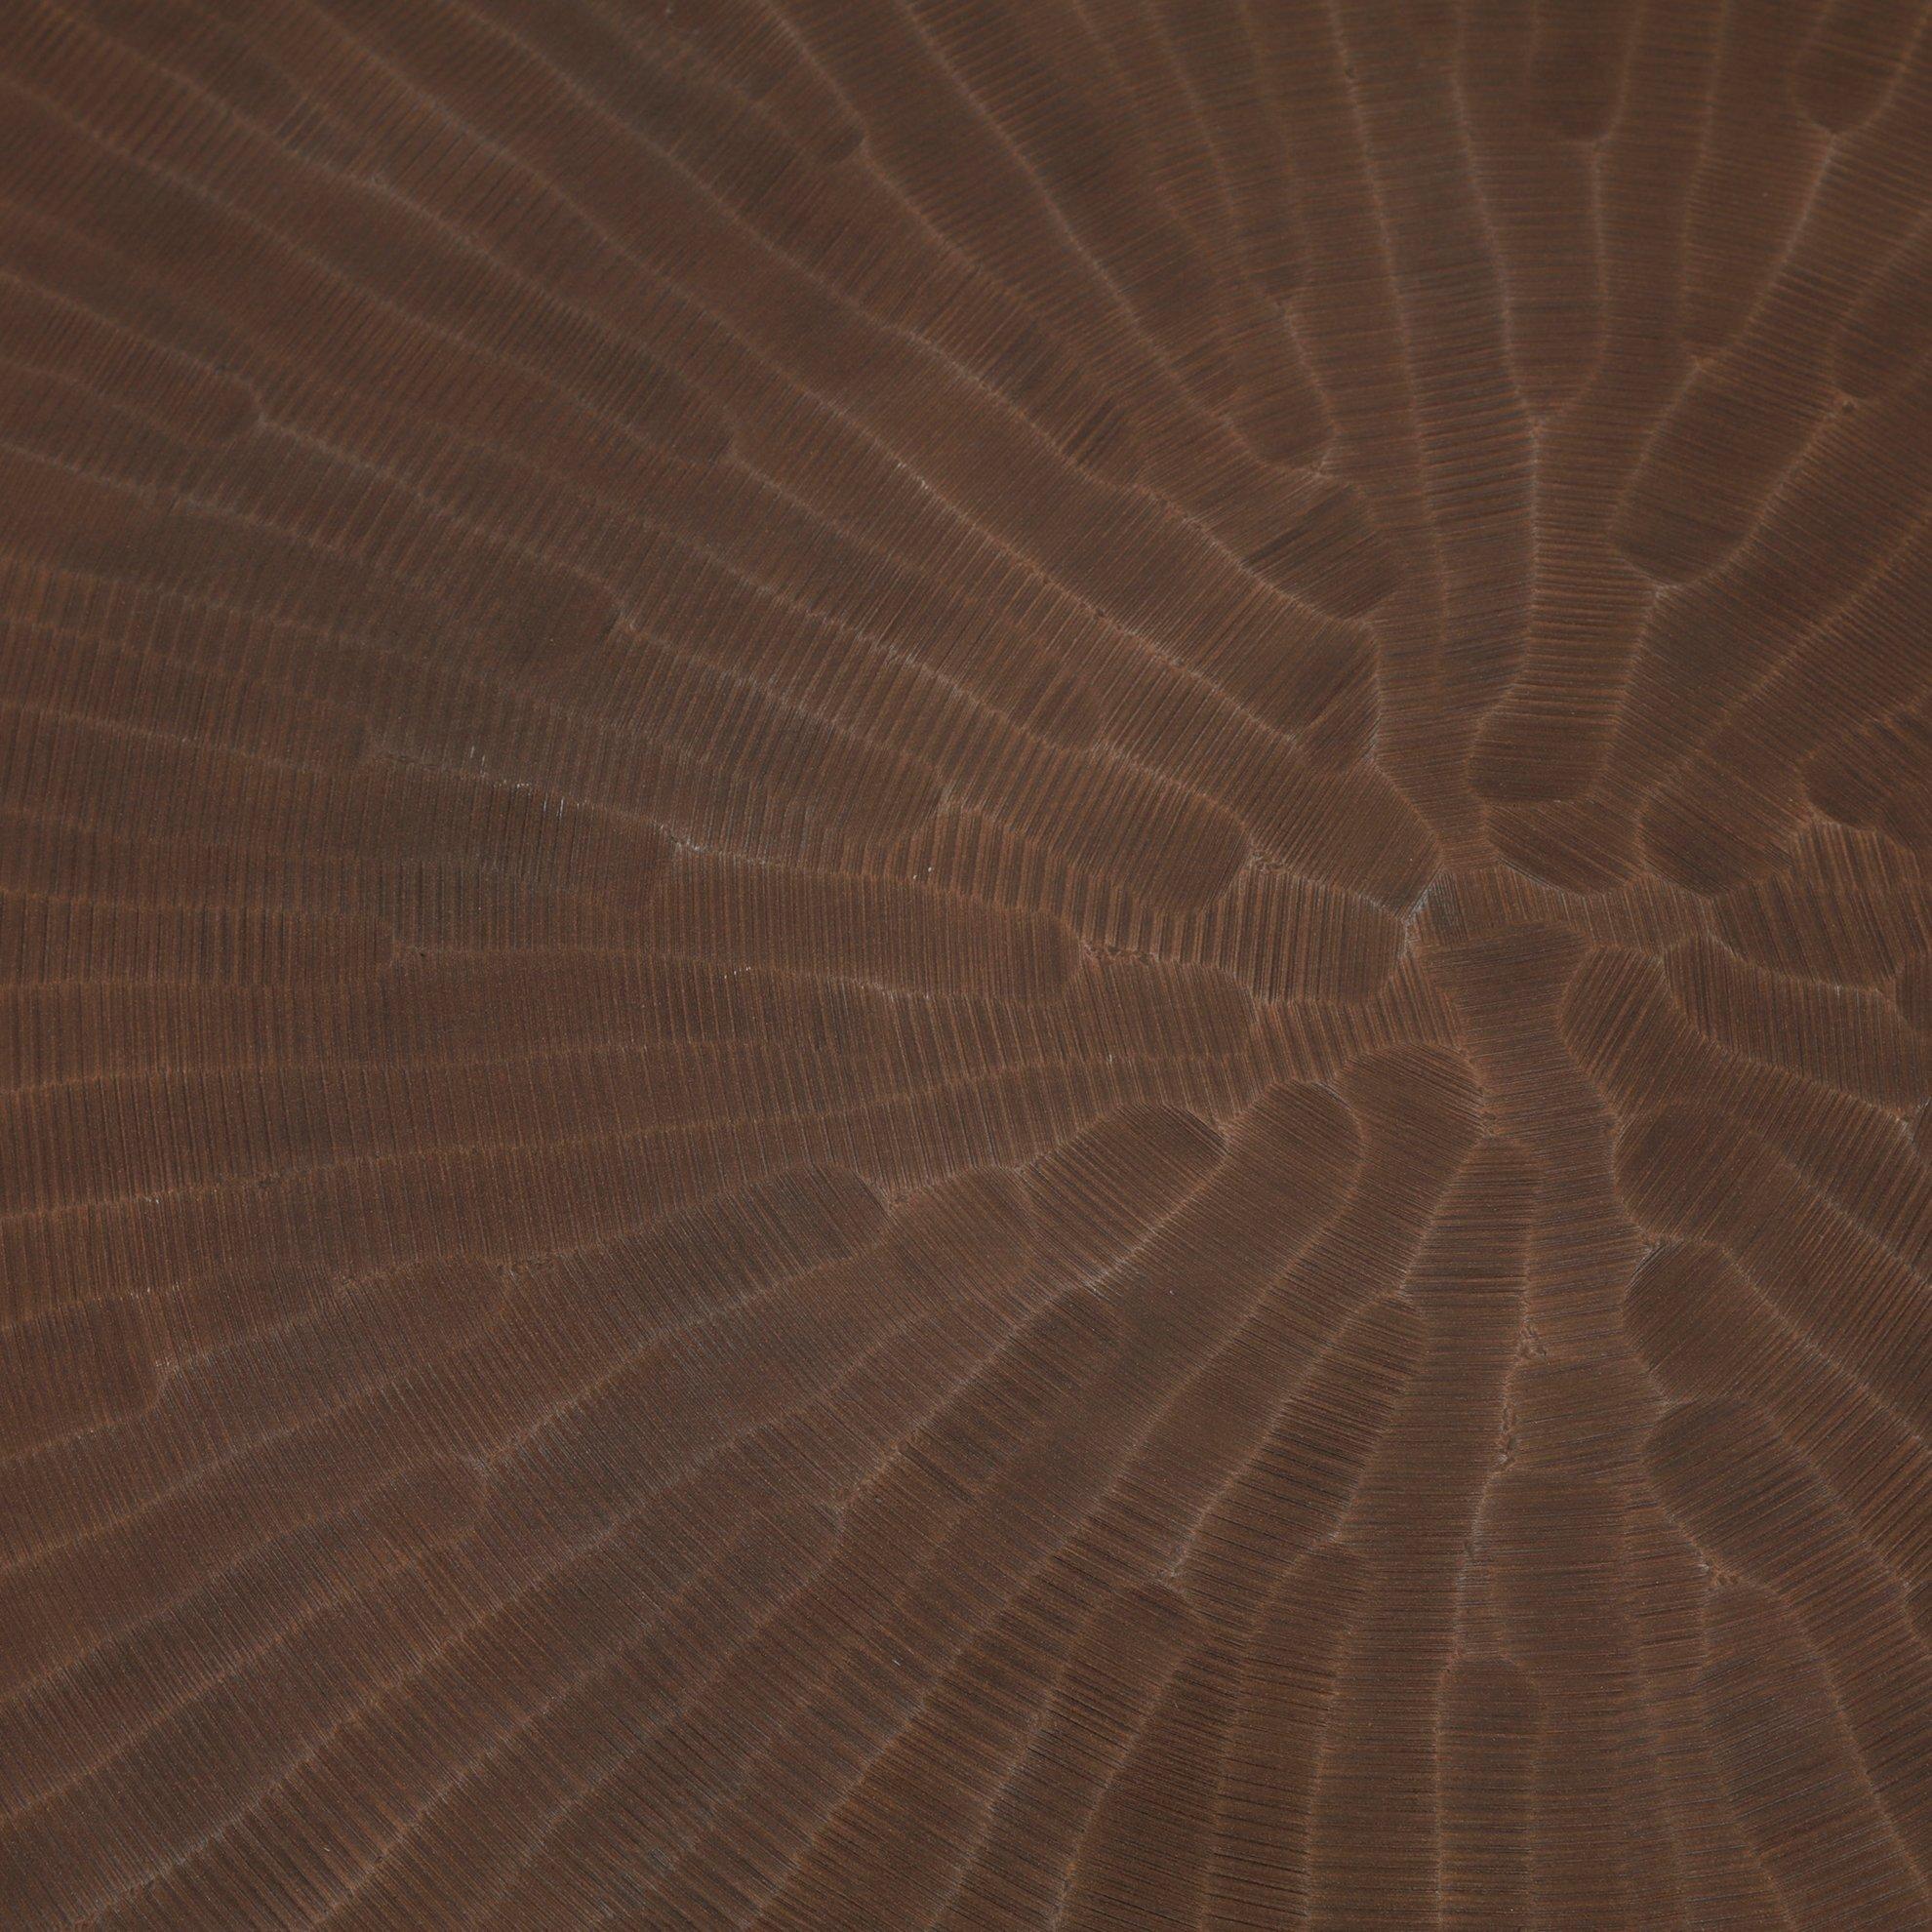 Metal Sehpa ( 49 X 51 Cm )